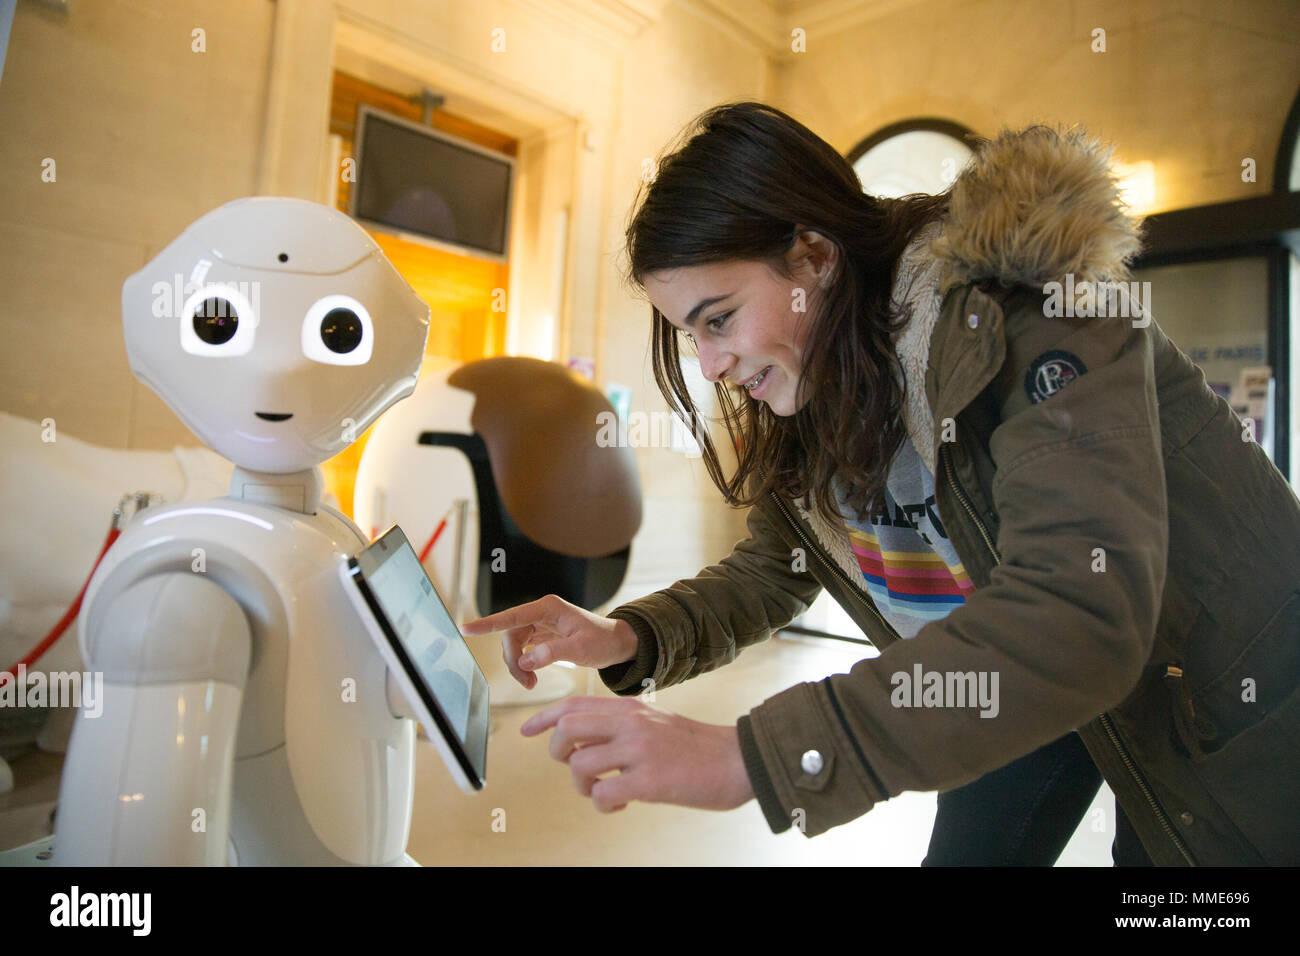 ROBOT DI PEPE Immagini Stock